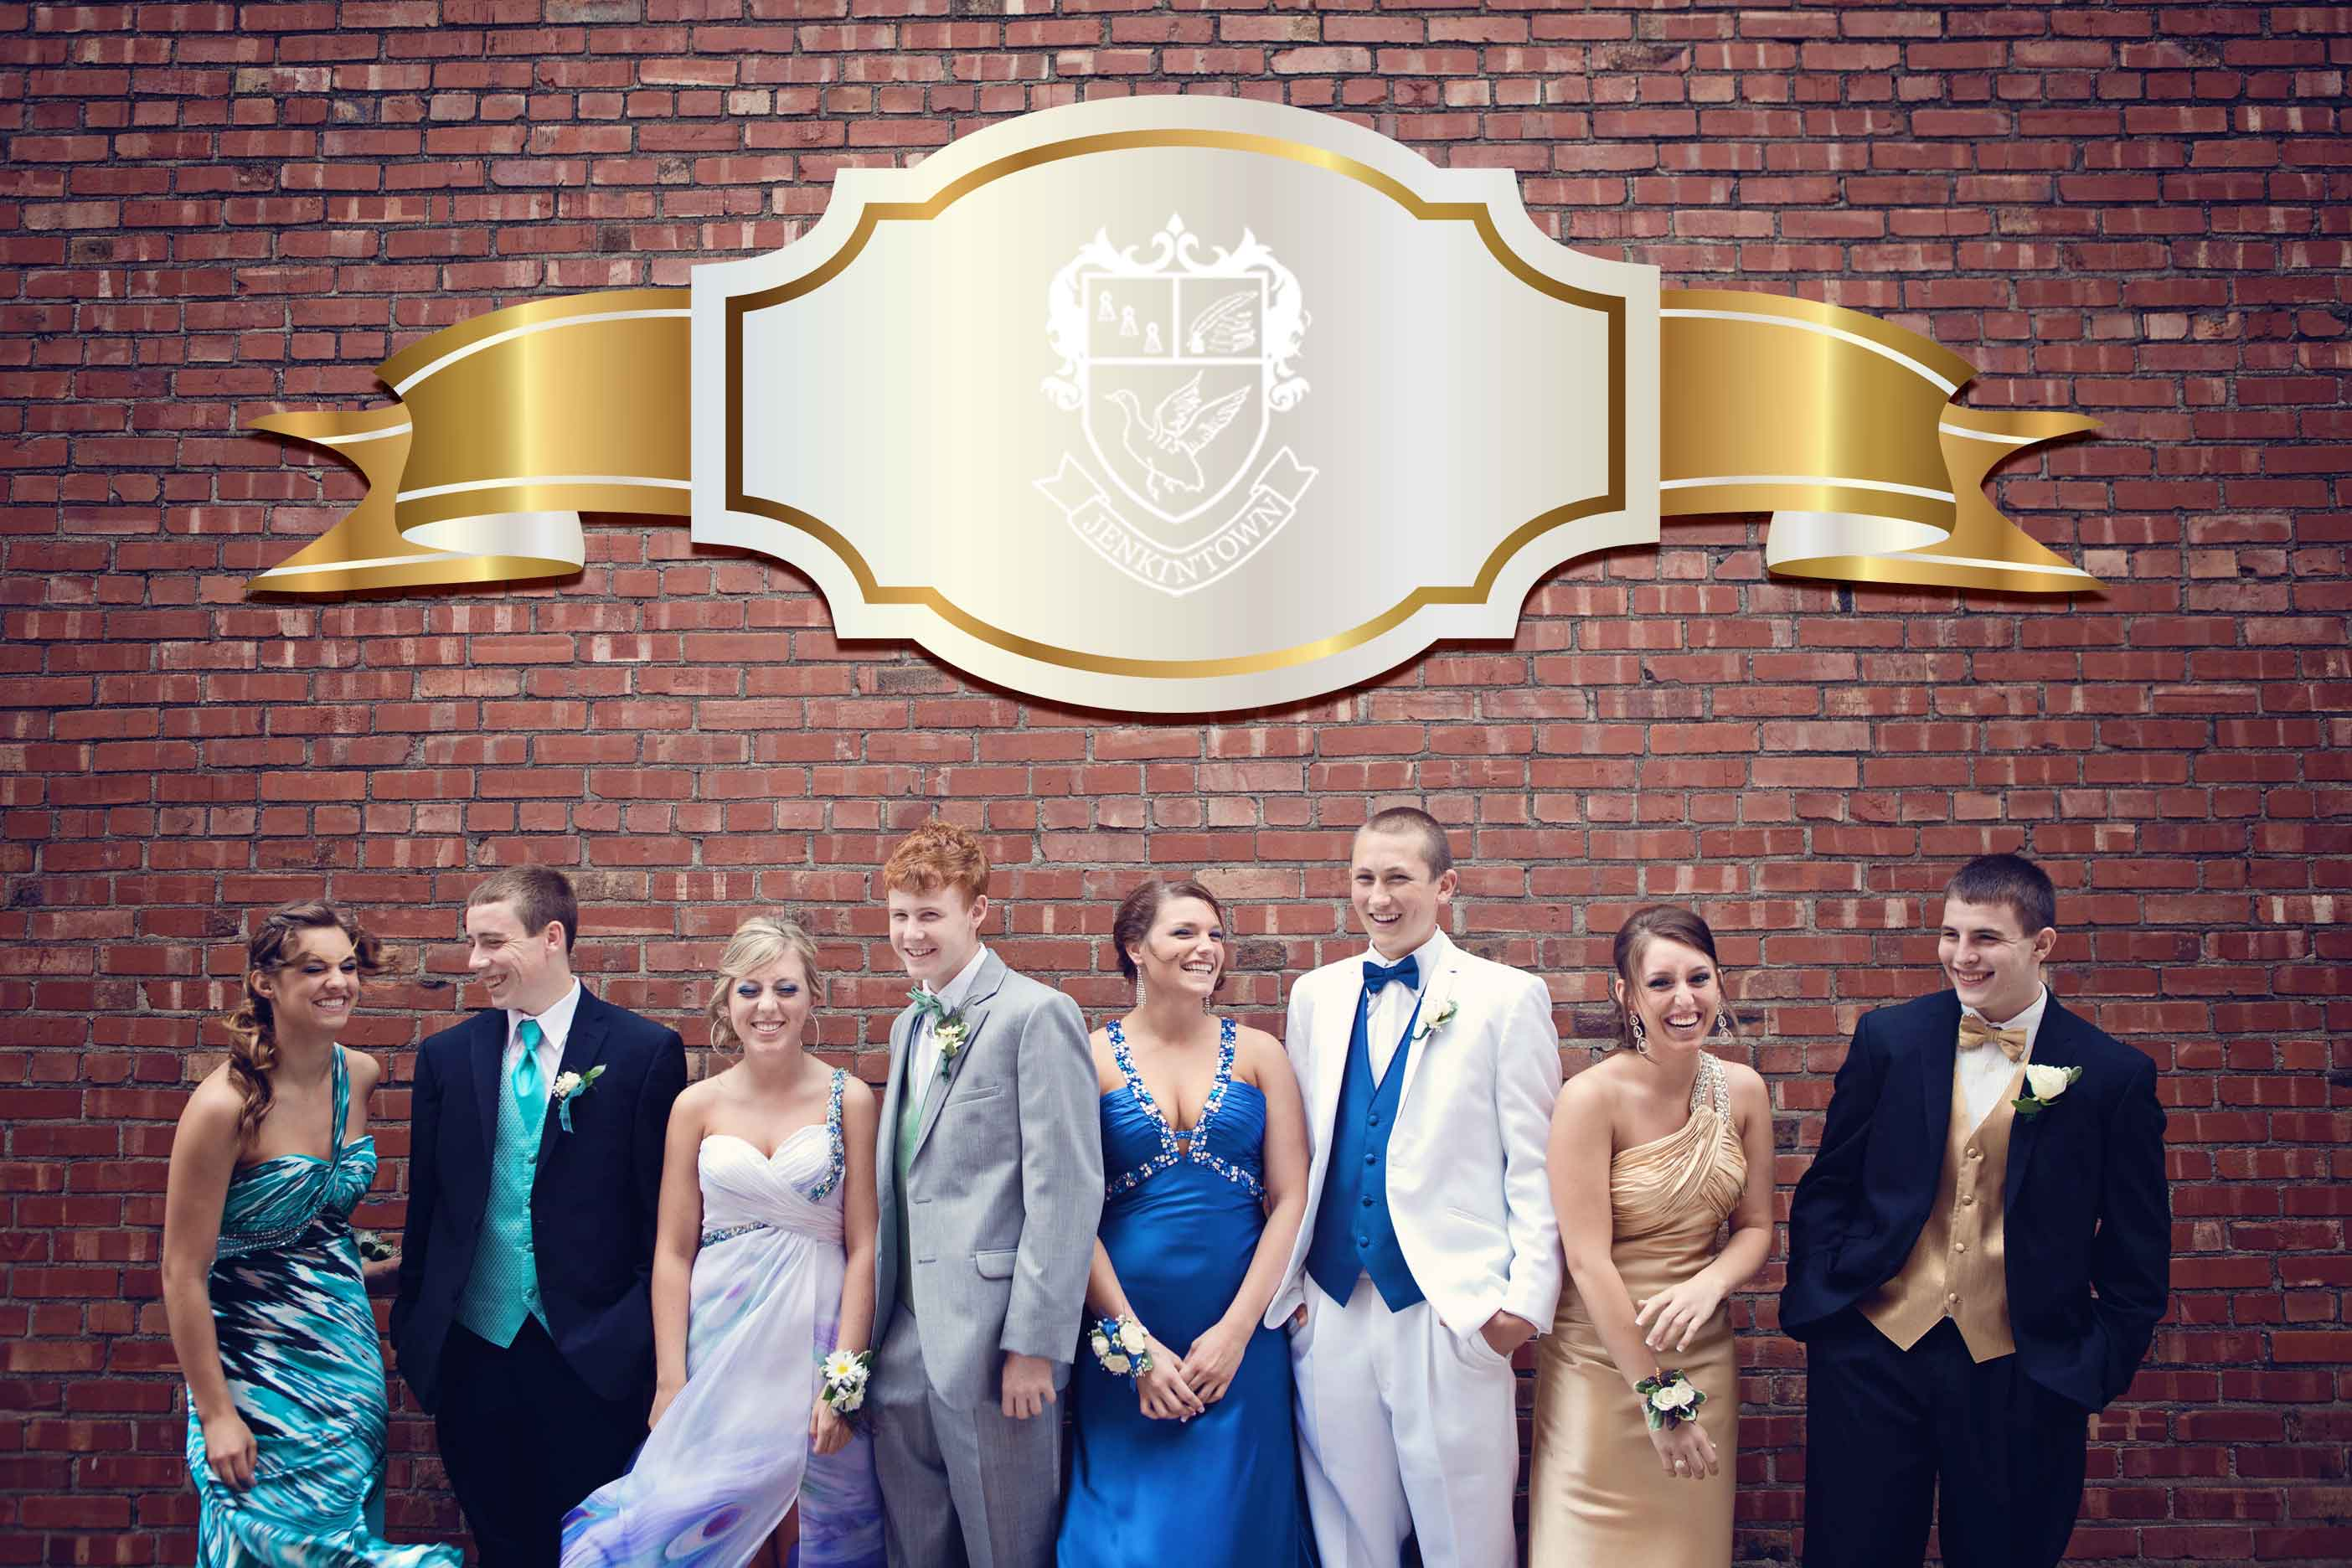 jenkintown high school prom